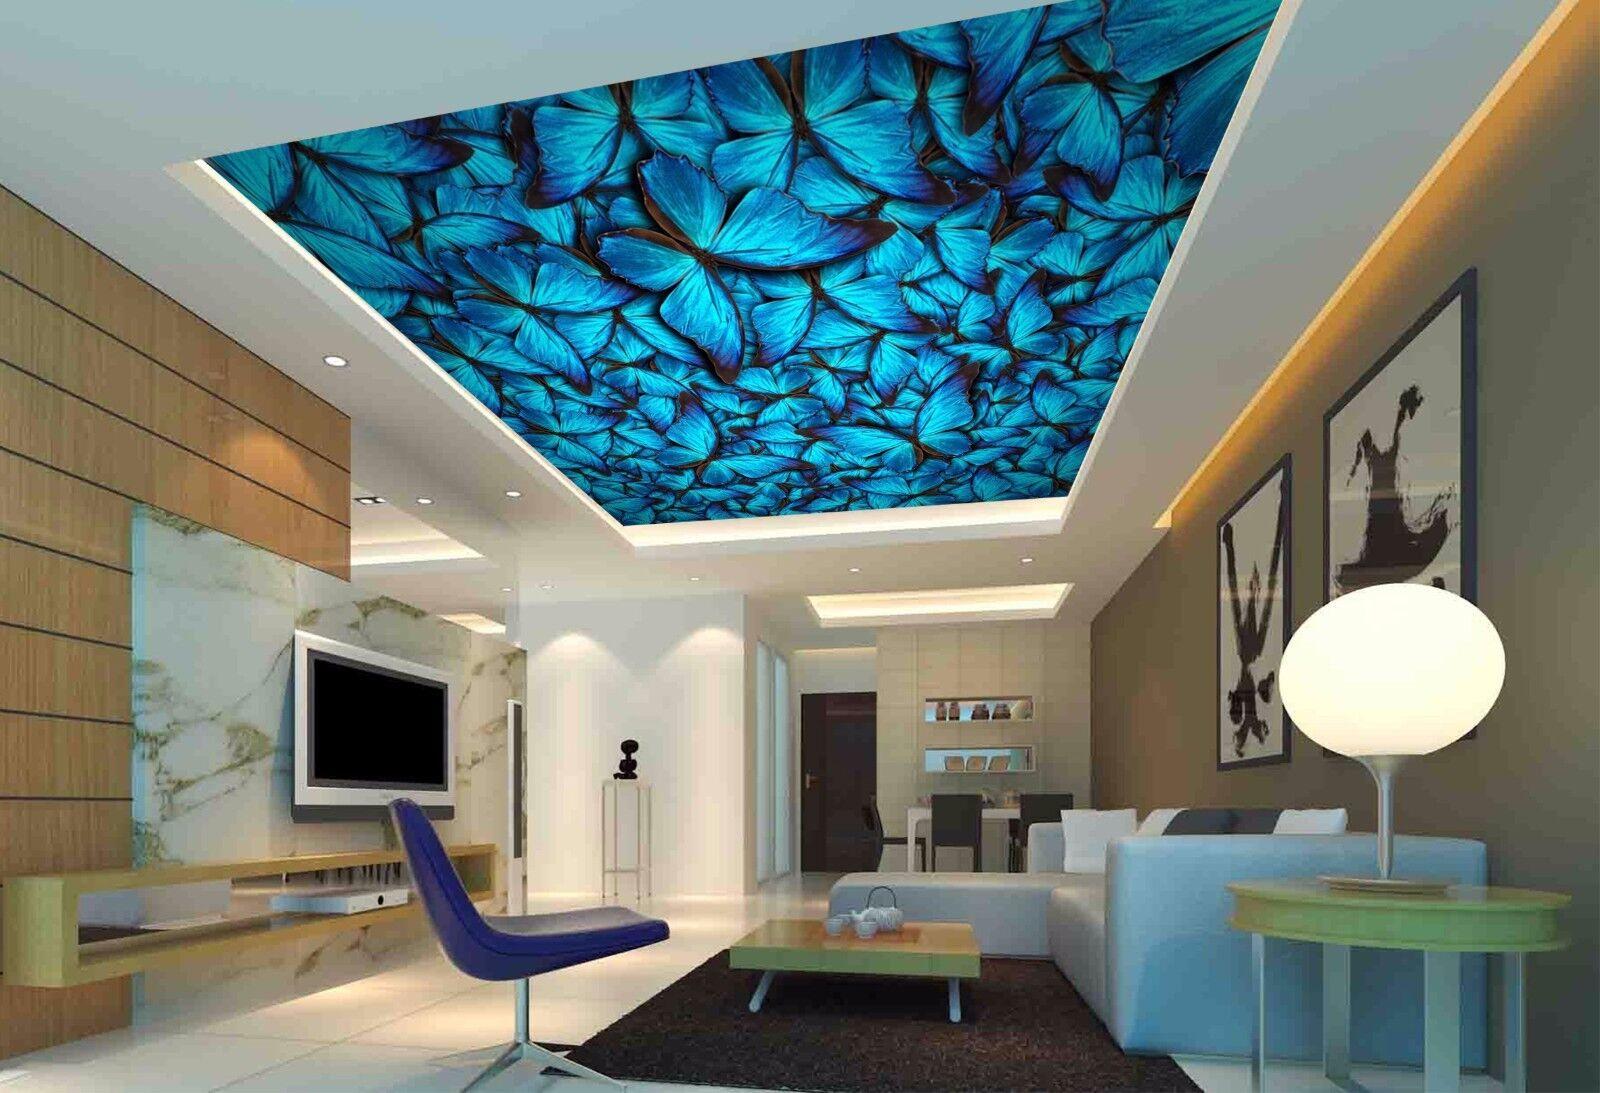 3D Butterflys 732 Ceiling WallPaper Murals Wall Print Decal Deco AJ WALLPAPER GB